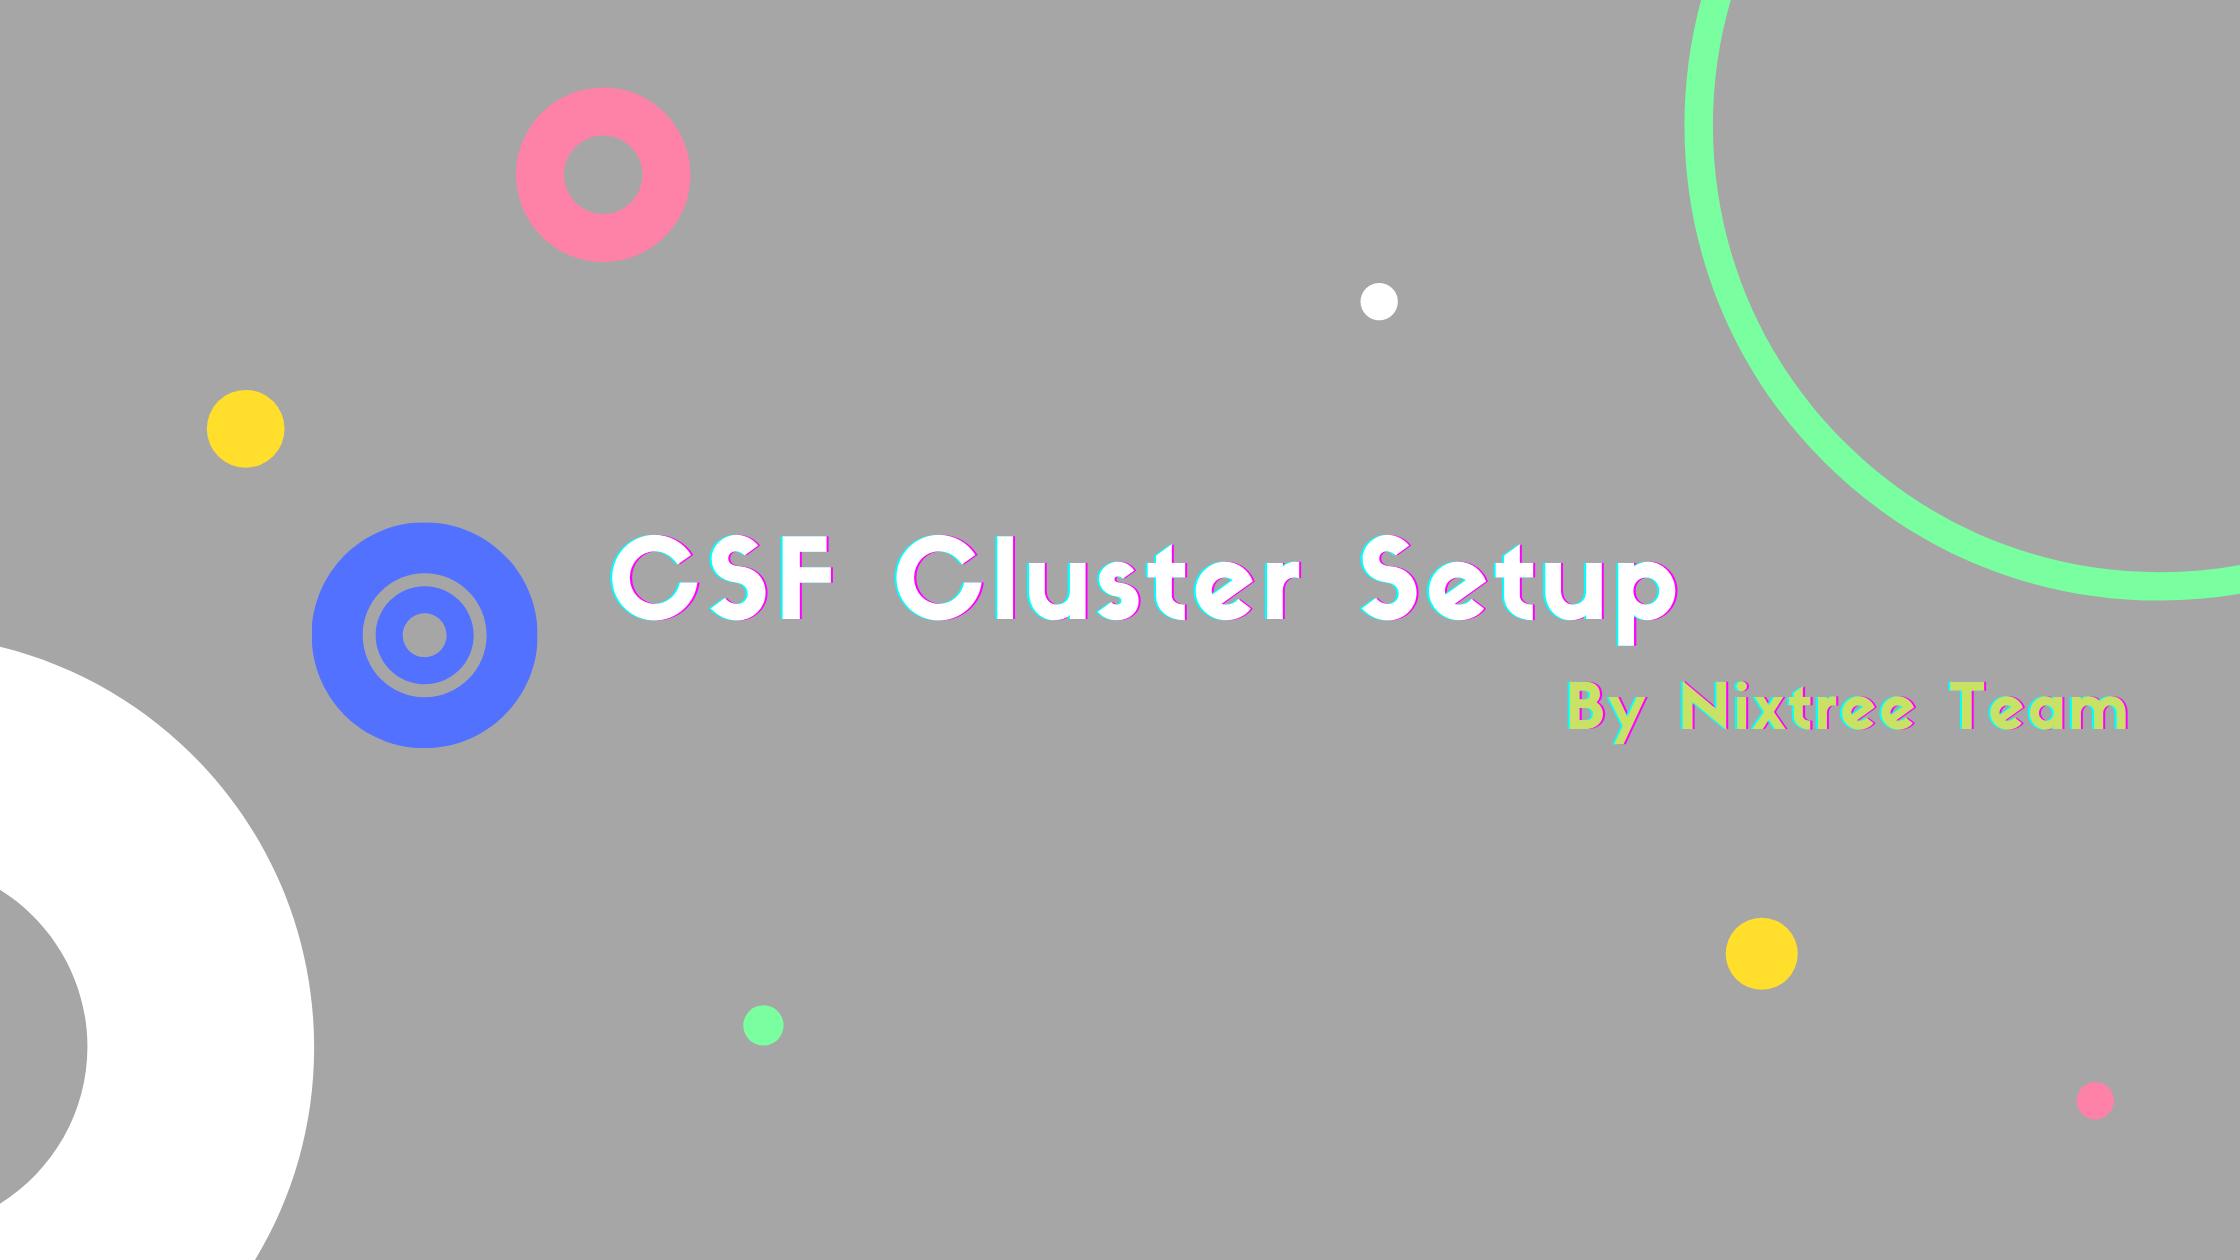 CSF cluster setup